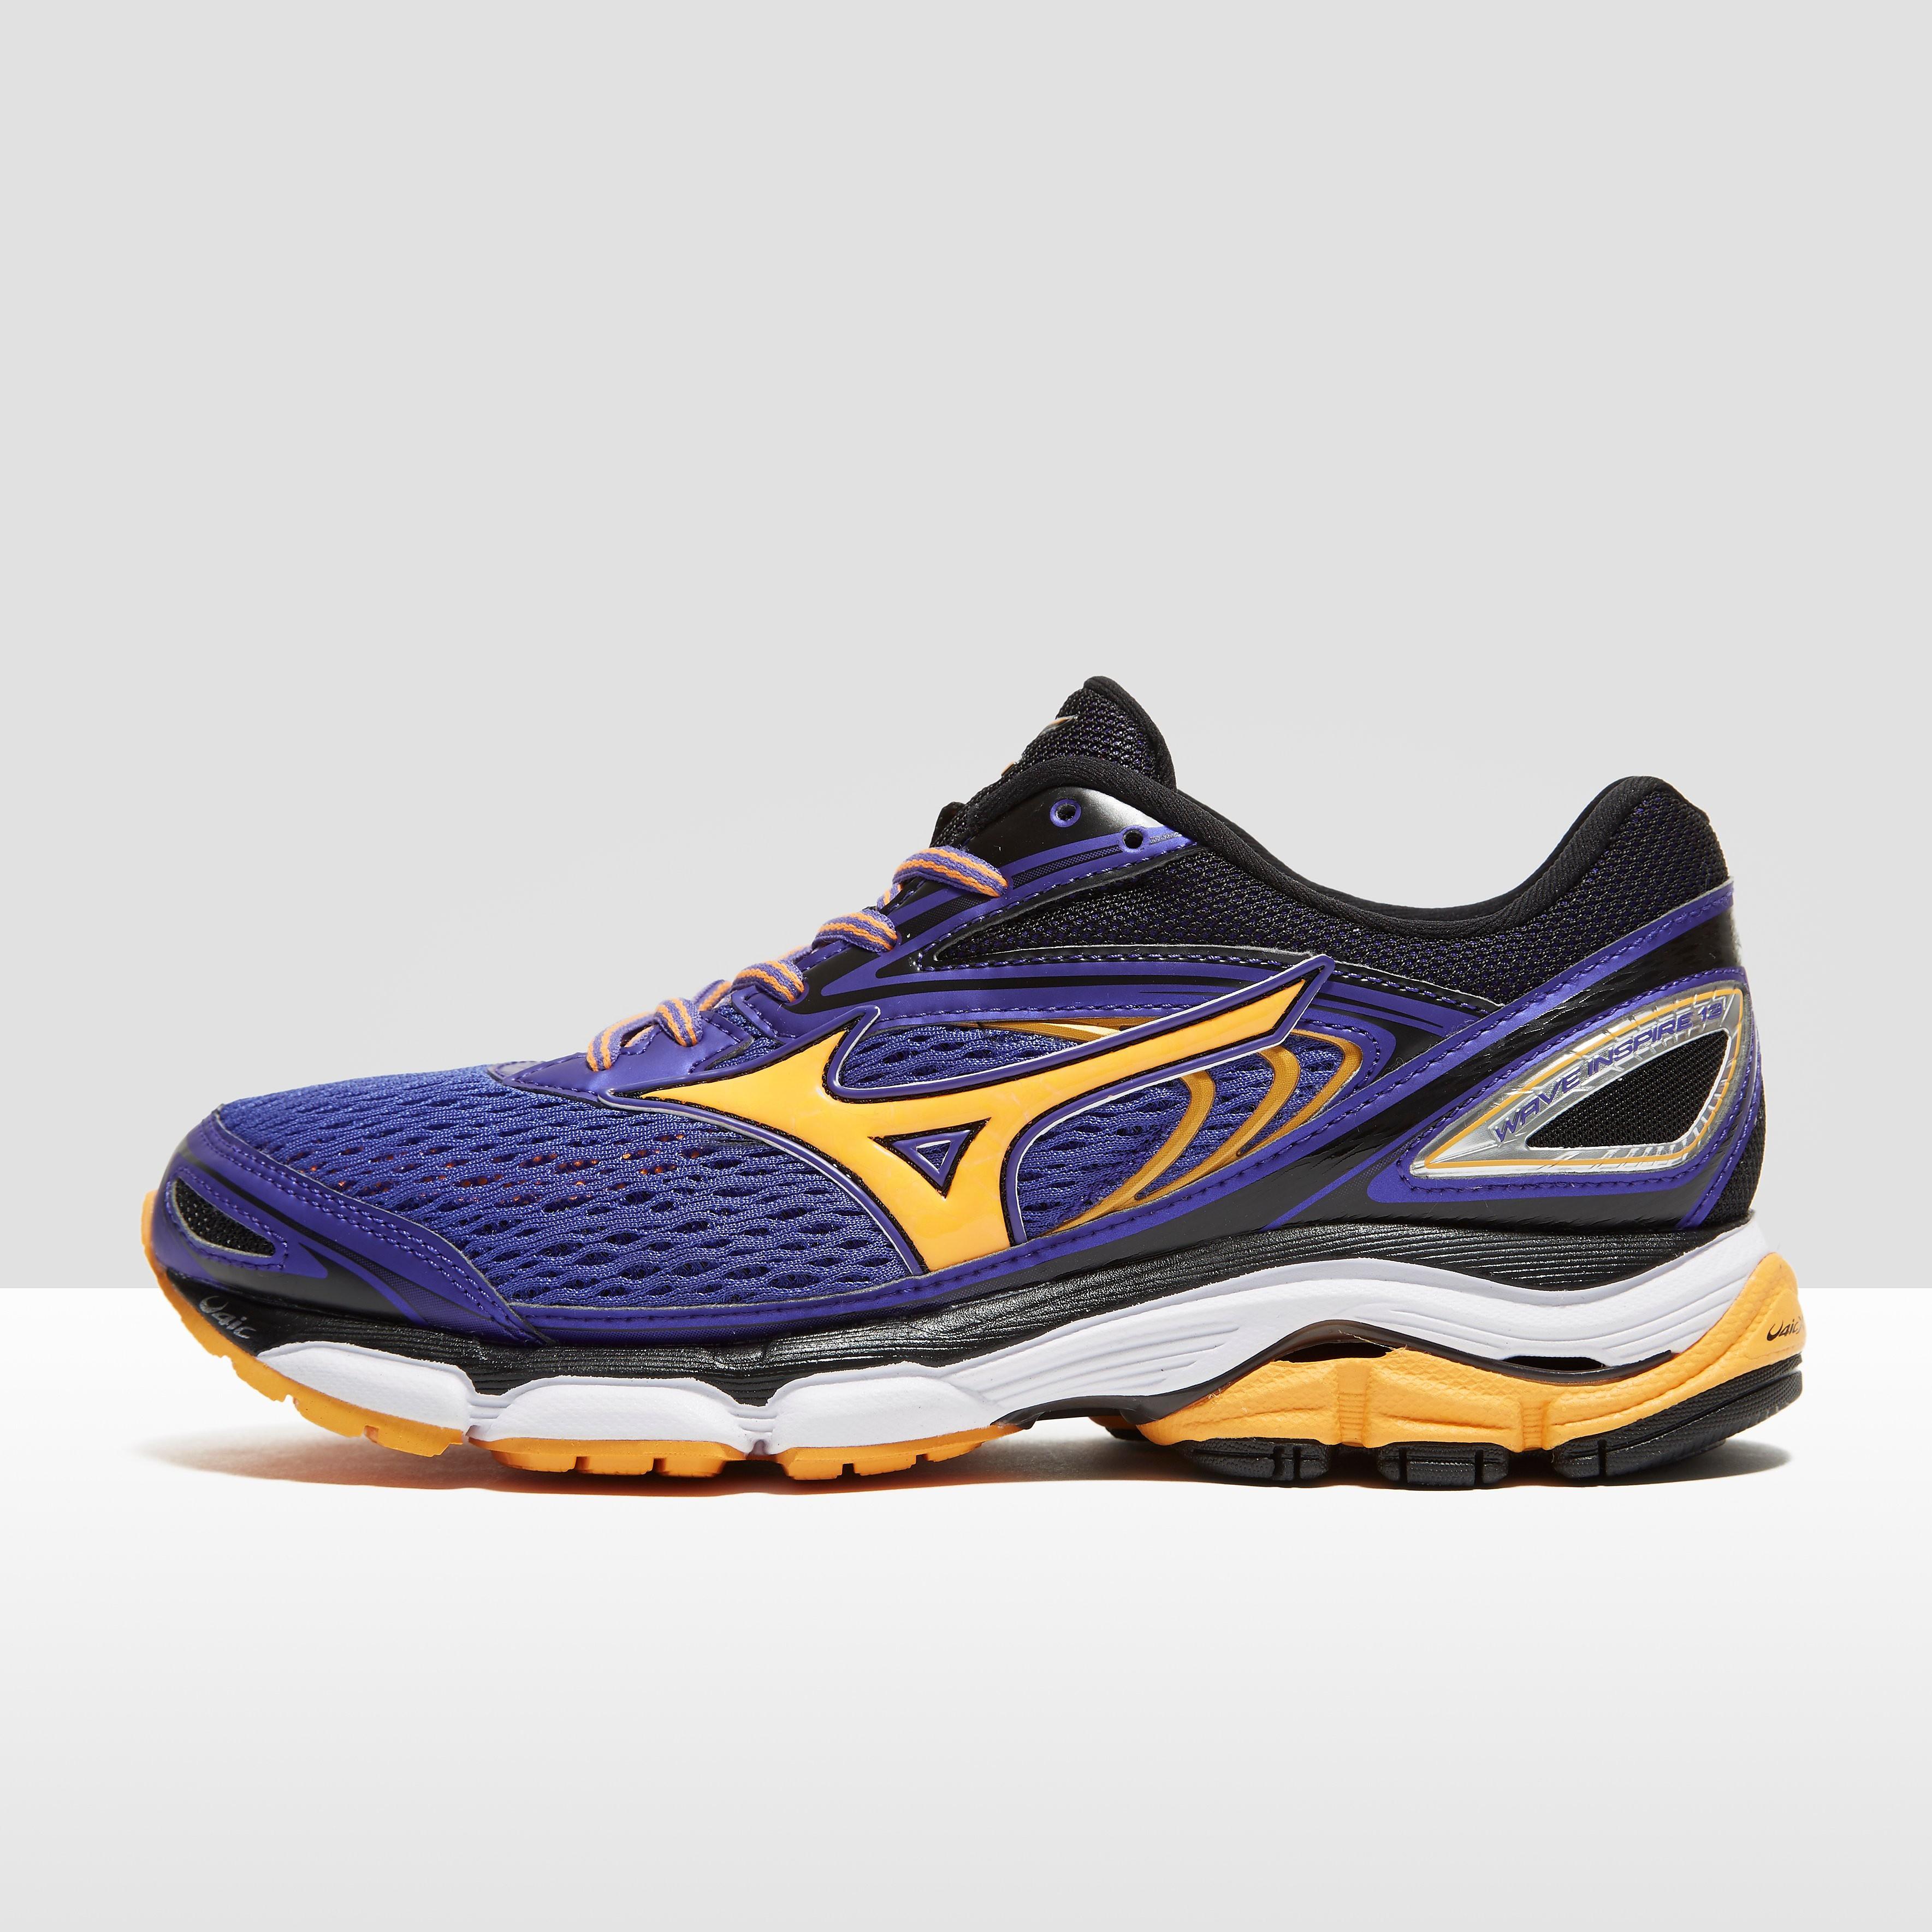 Mizuno Wave Inspire 13 Women's Running Shoes